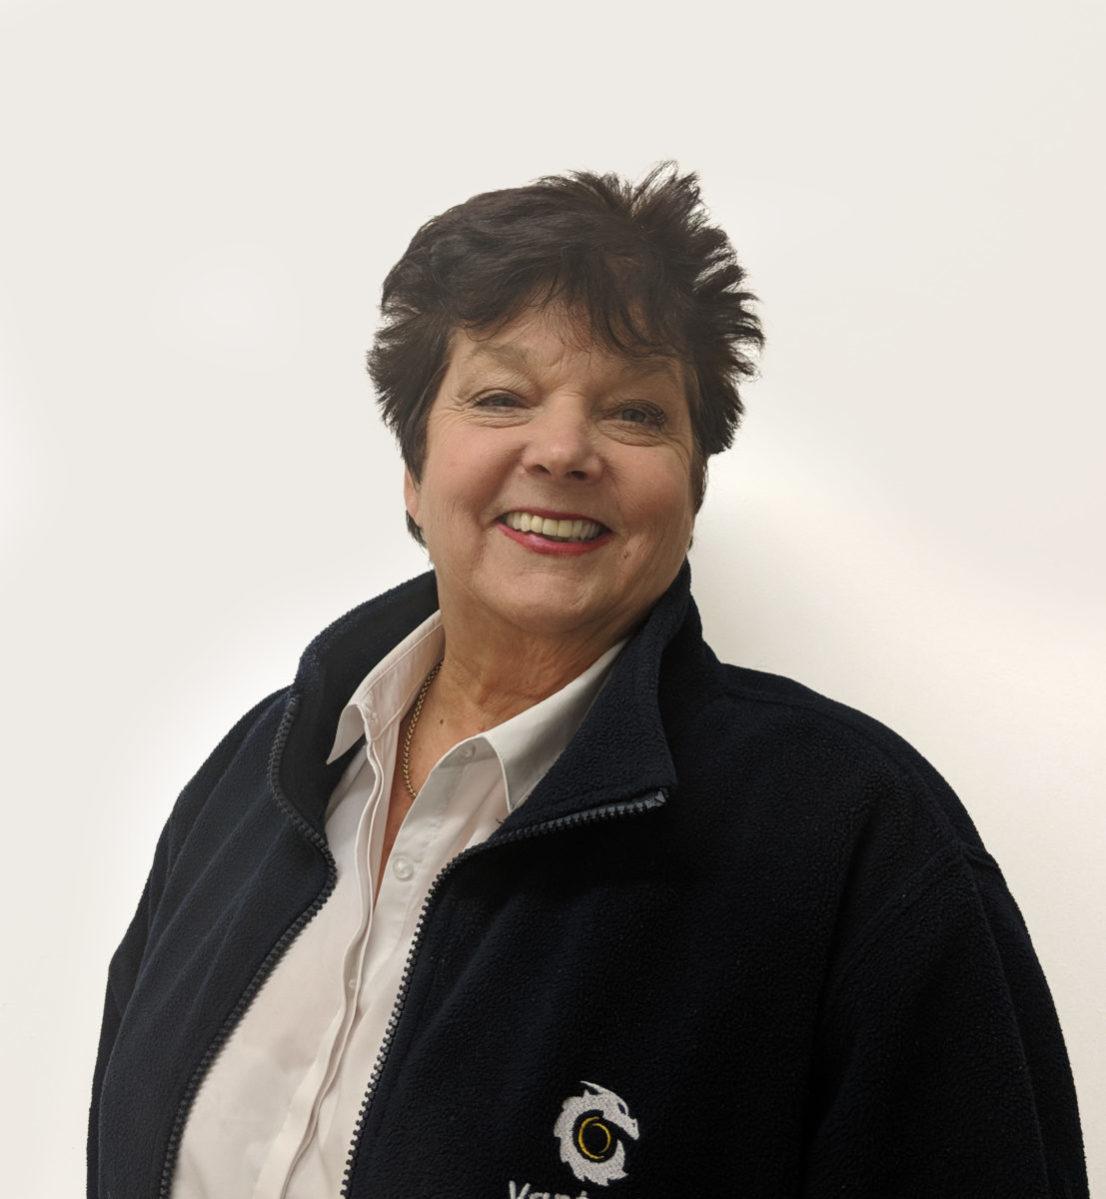 Carol Tanner